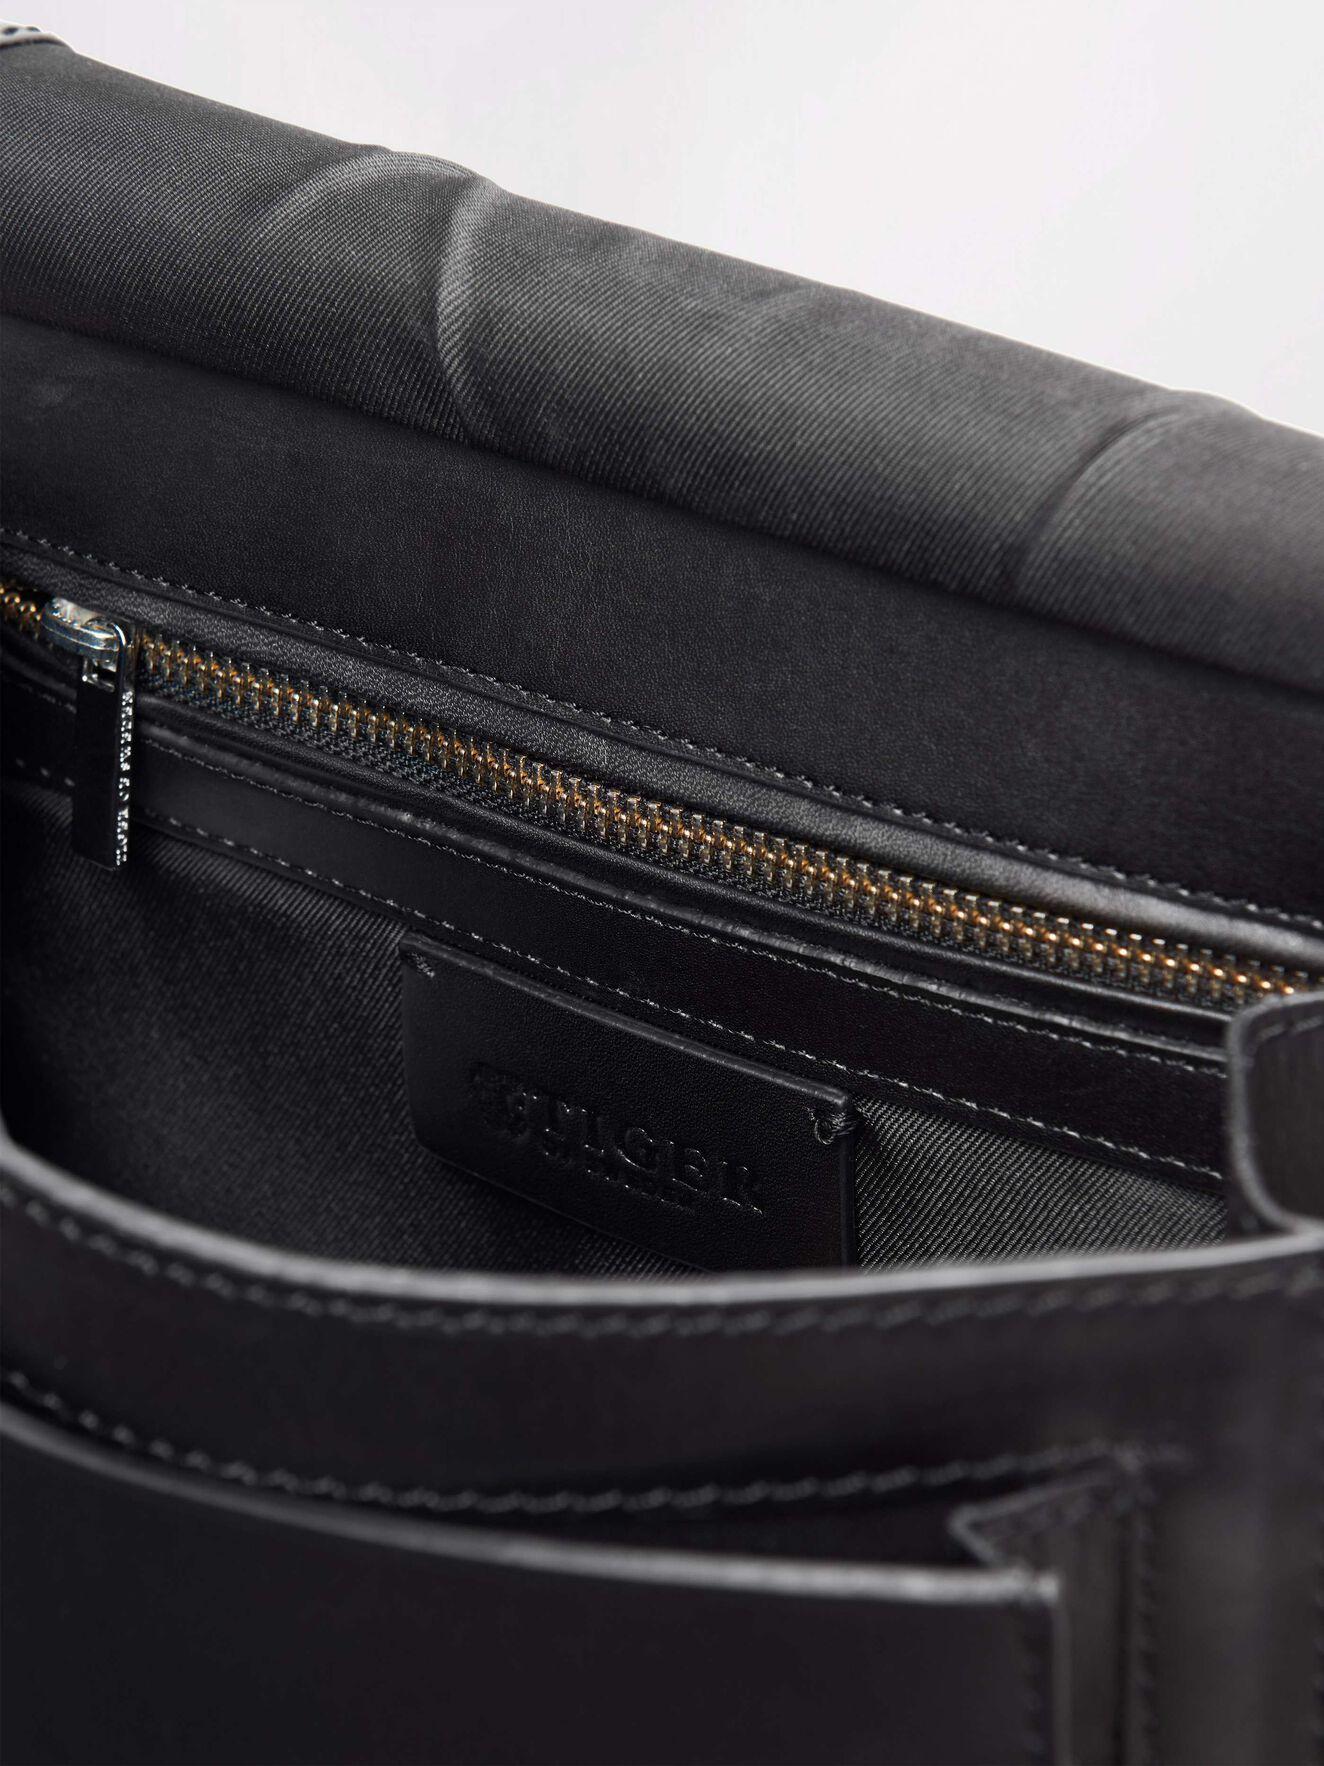 ... Barron Crossbody Bag in Black from Tiger of Sweden 8c0cdfc102